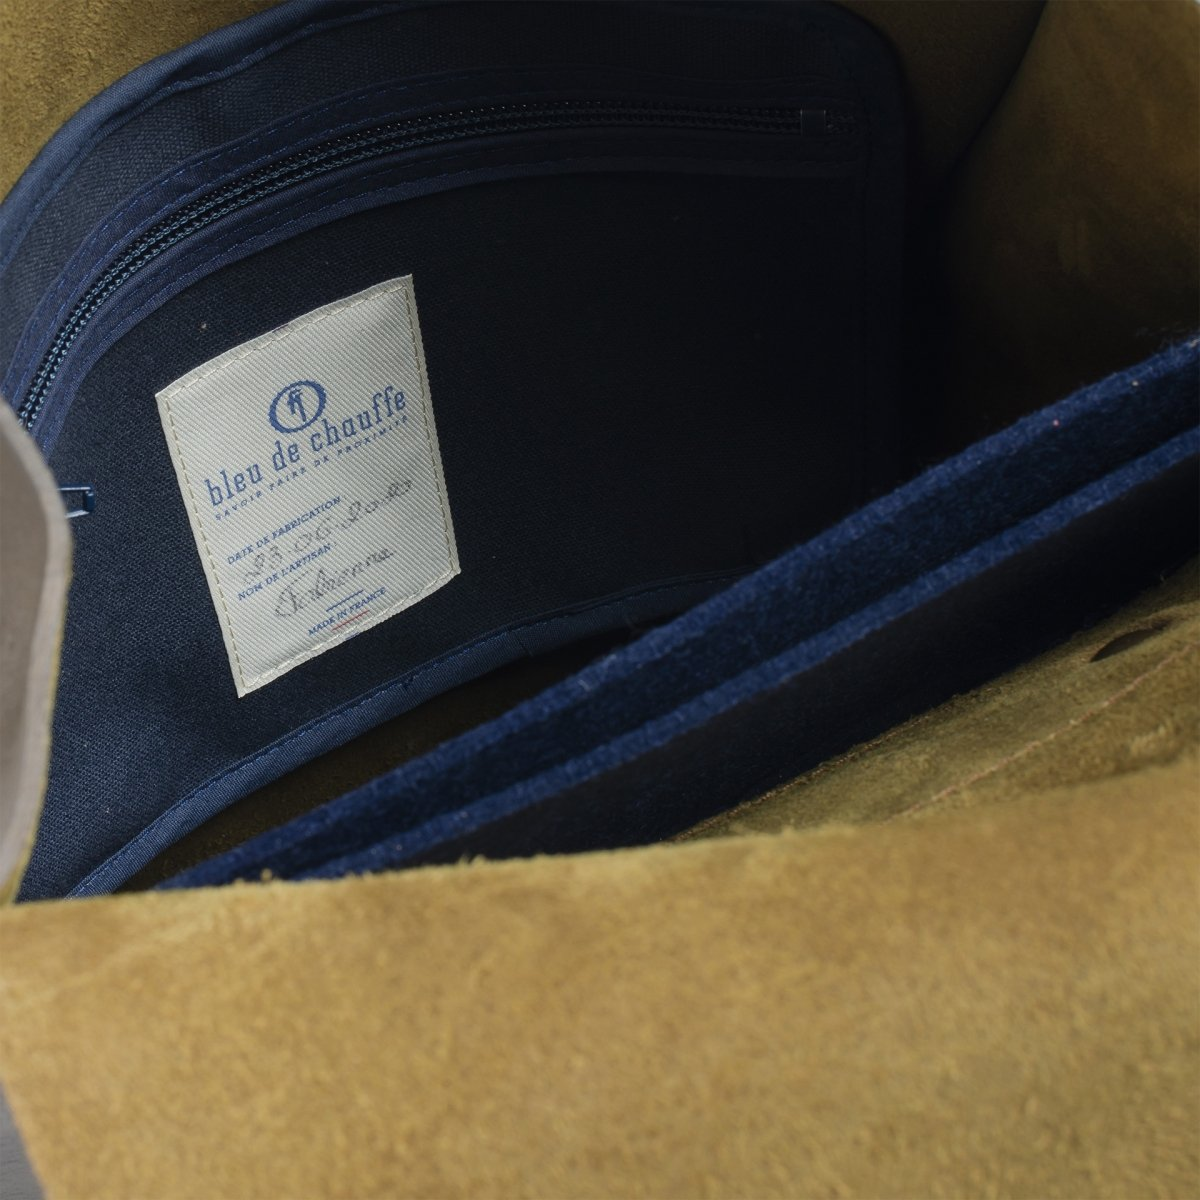 Puncho leather backpack - Khaki / E Pure (image n°5)